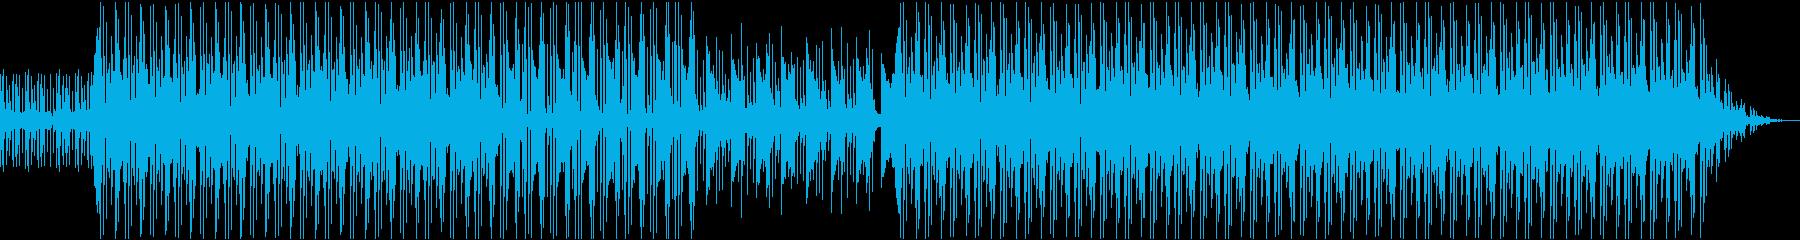 Lo-Fi analog Guitarの再生済みの波形